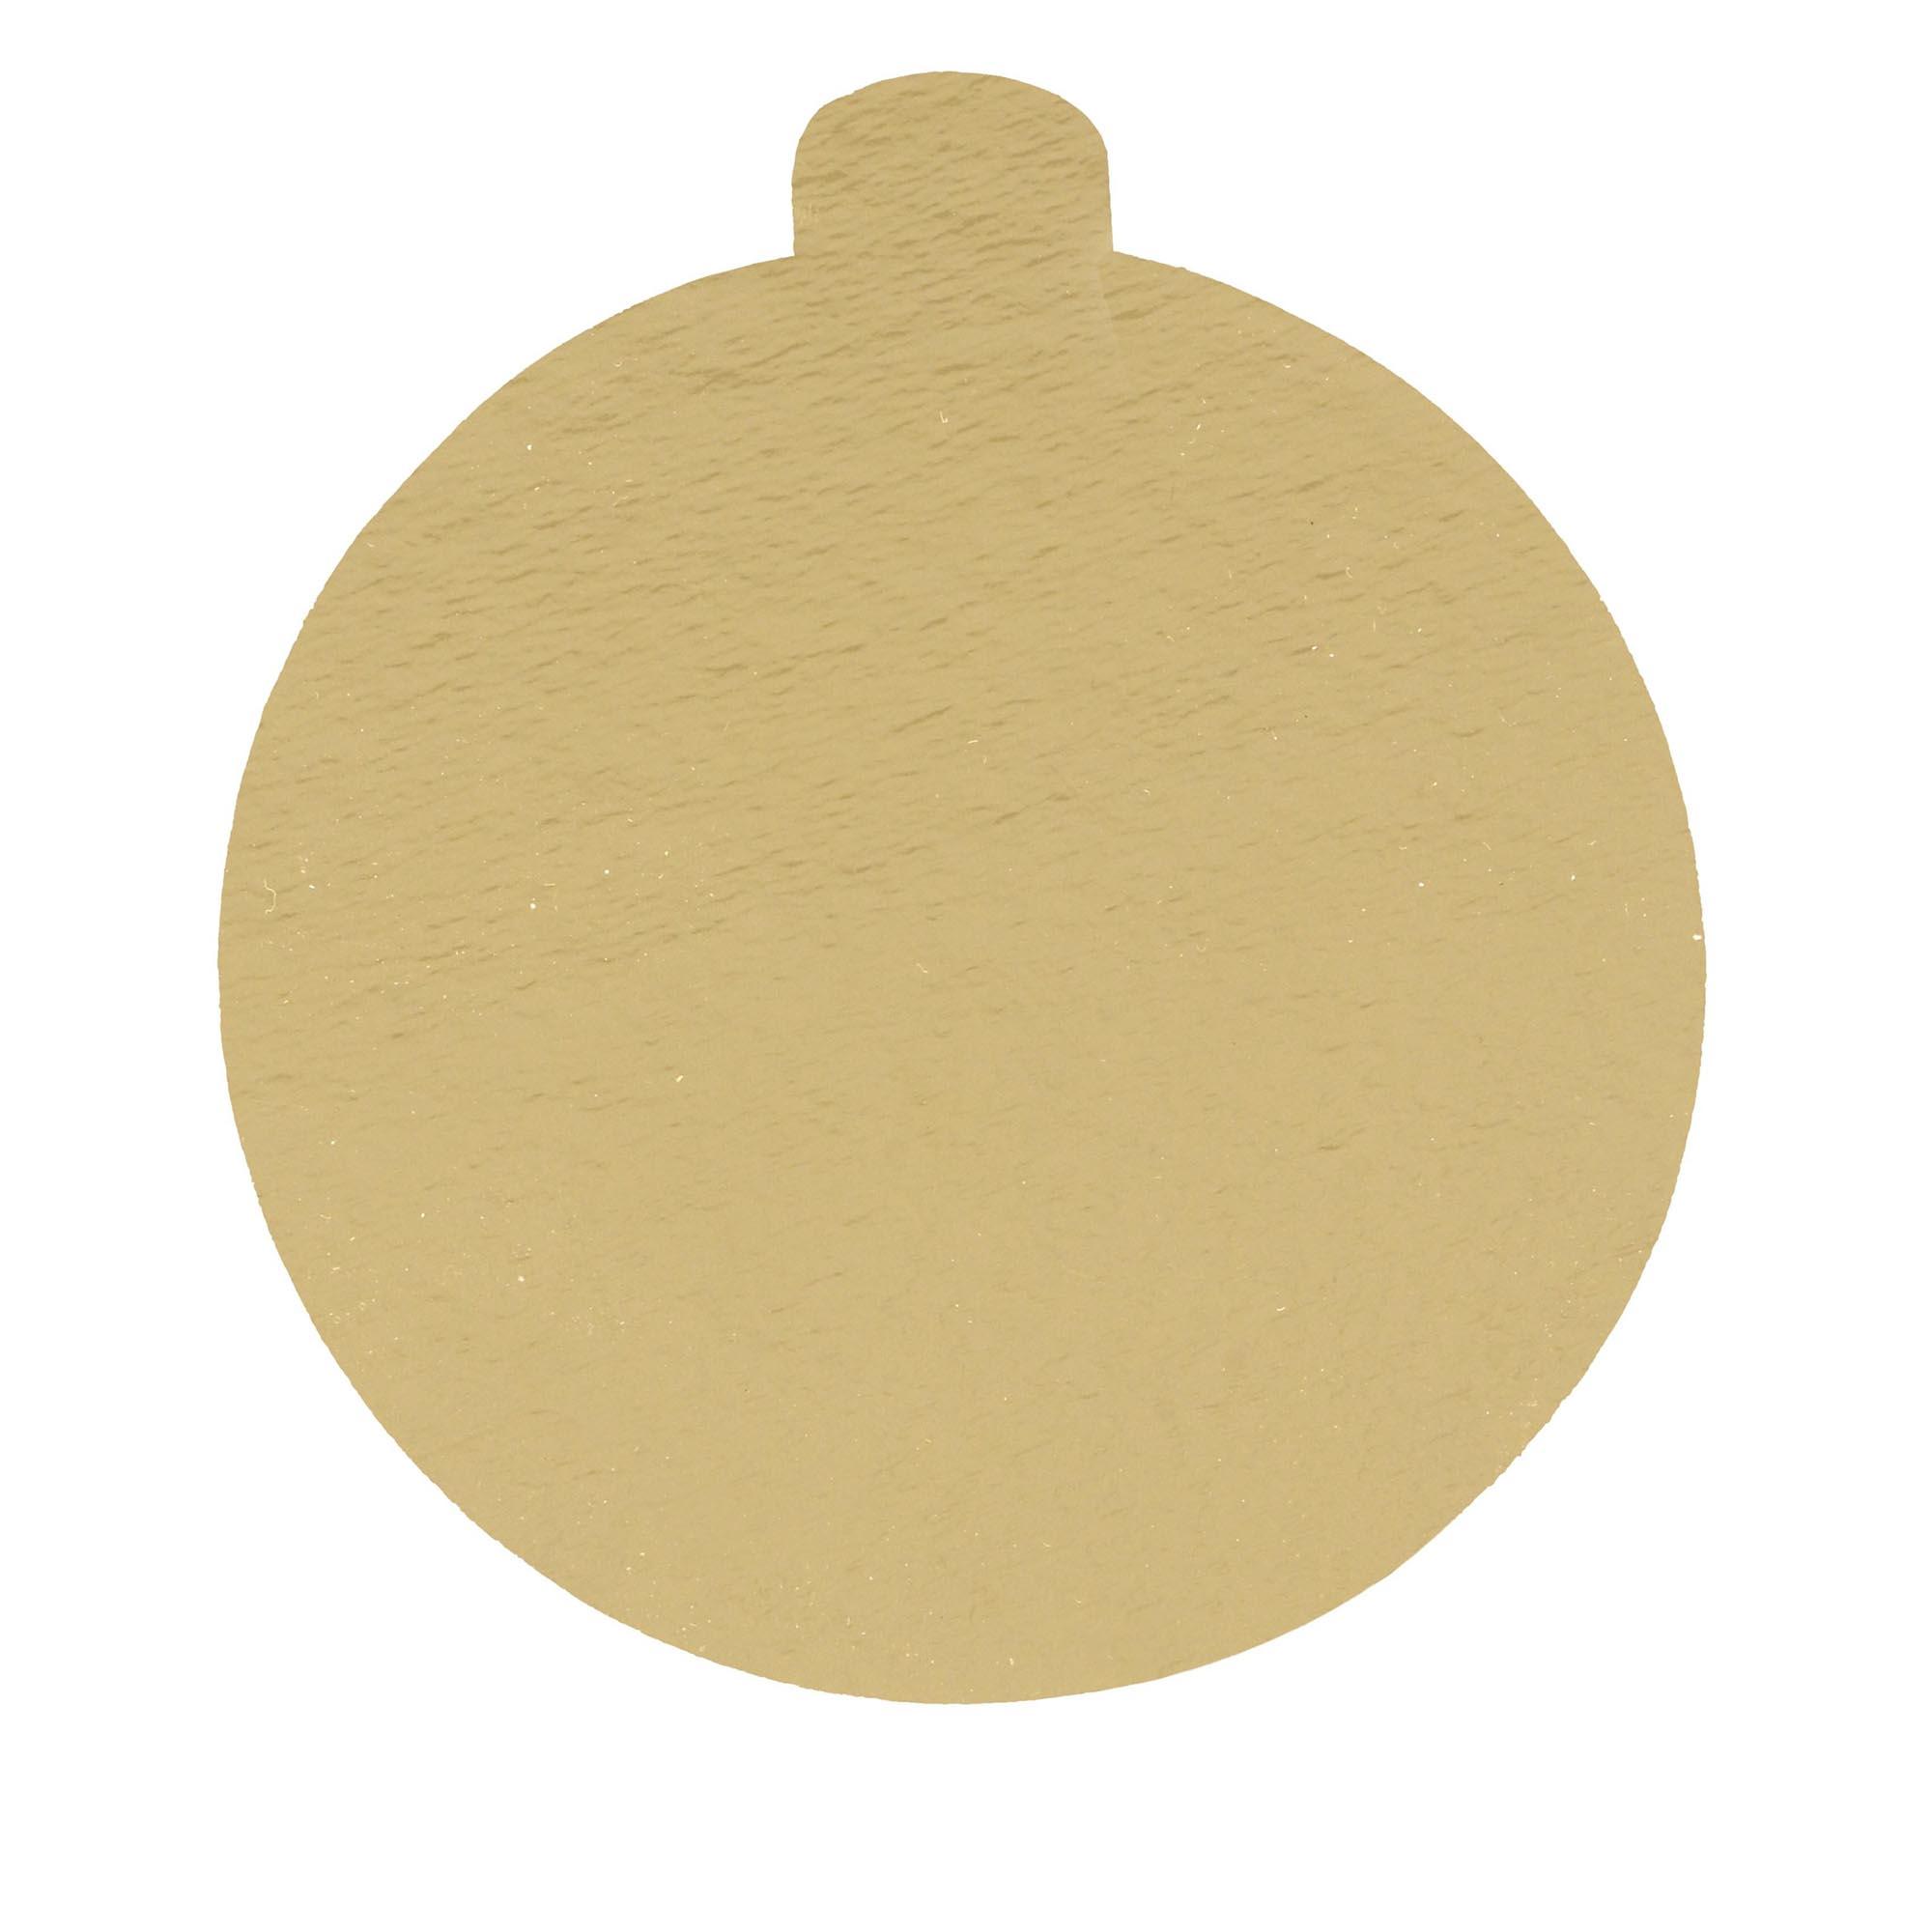 200 Bases Laminadas, Suporte P/ Doces, 10cm - Ouro